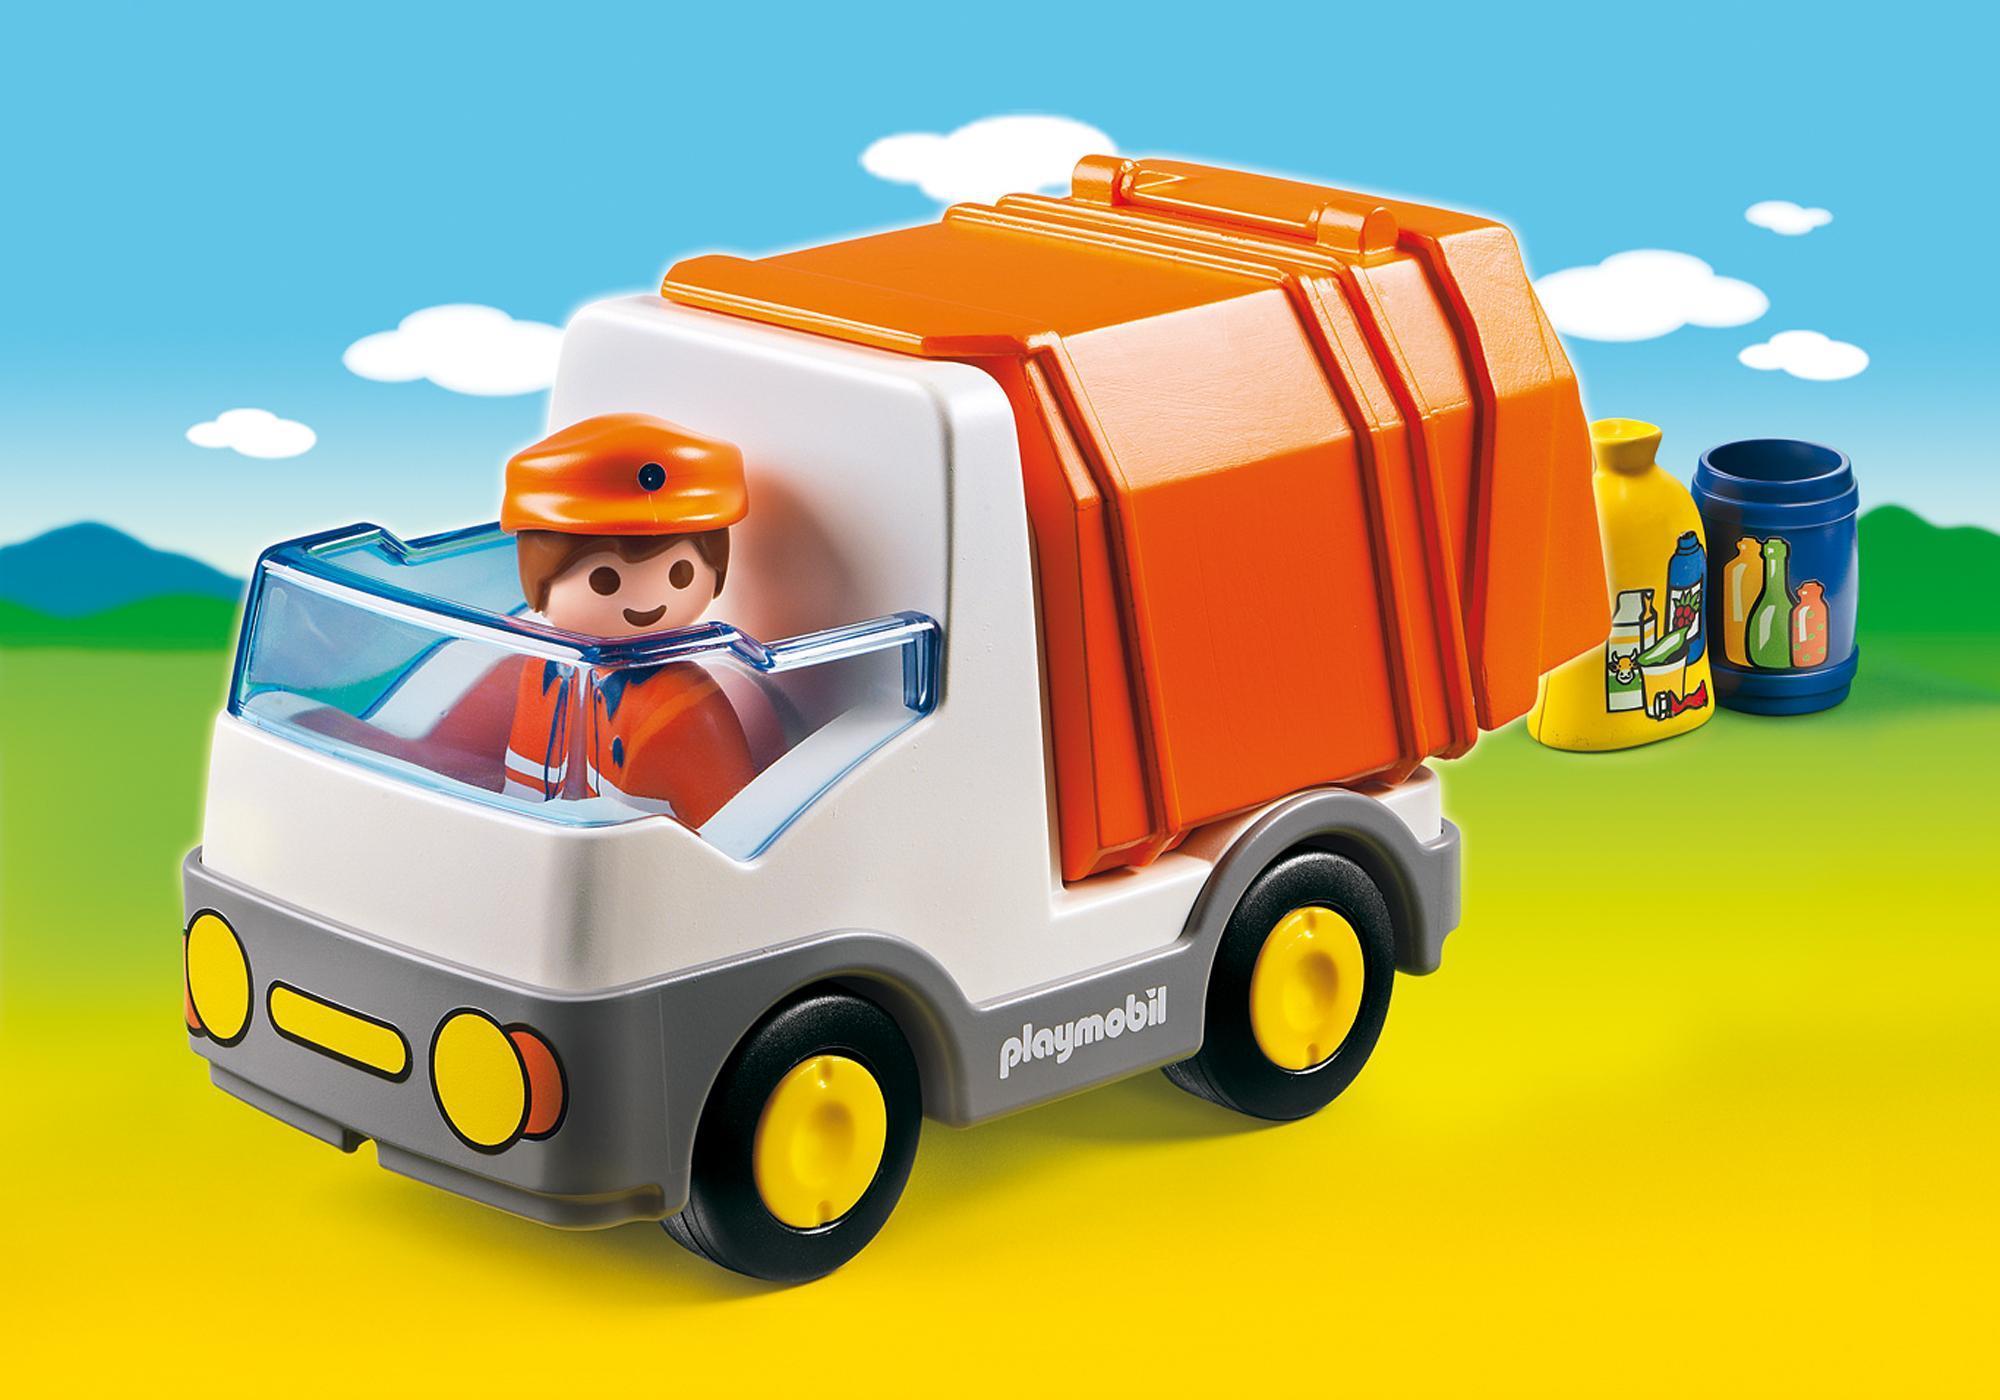 http://media.playmobil.com/i/playmobil/6774_product_detail/1.2.3 Recycling Truck